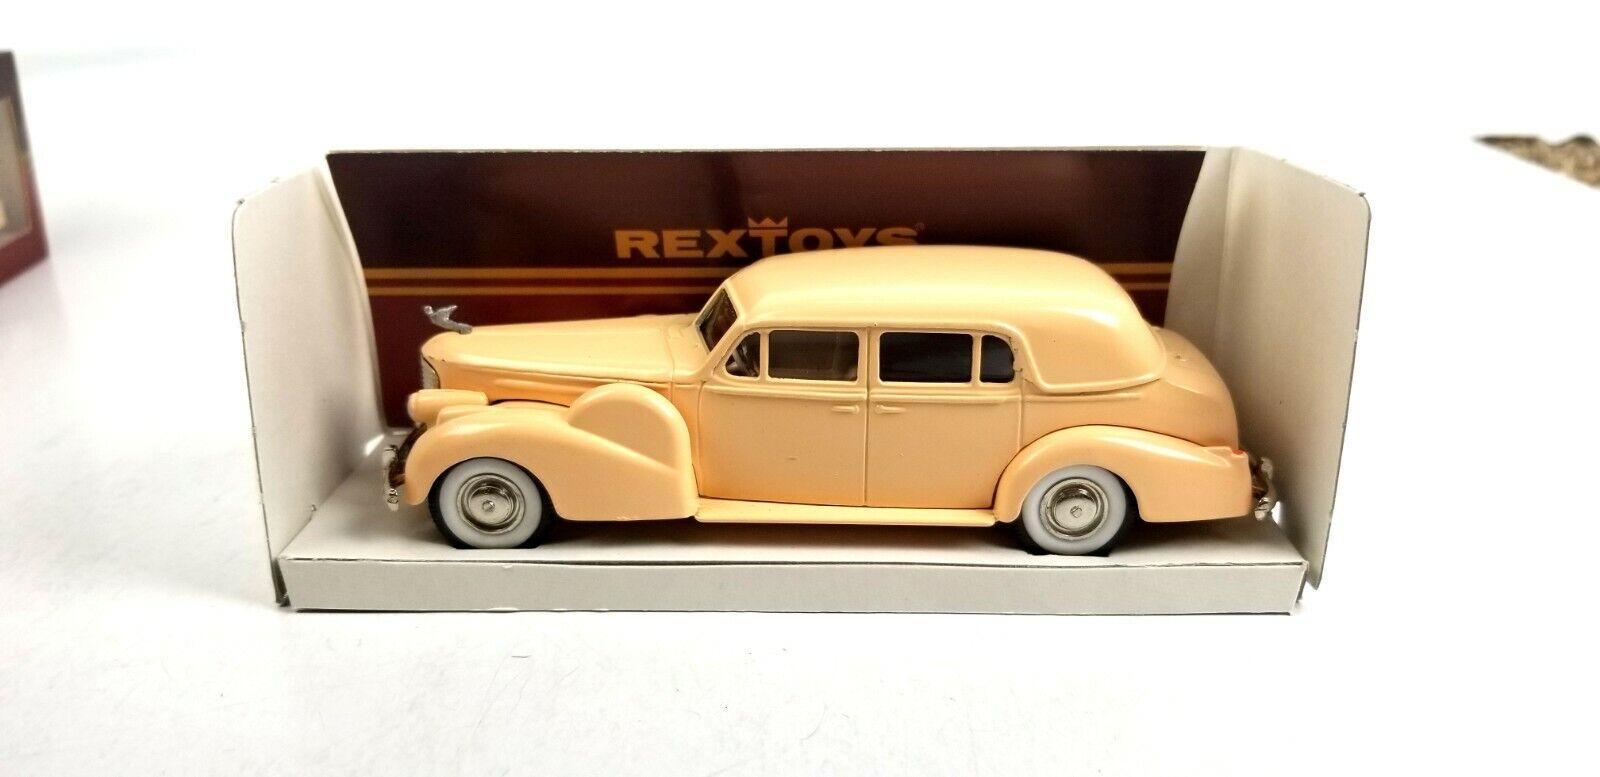 Compra calidad 100% autentica RexJuguetes RexJuguetes RexJuguetes 1938-40 Cadillac V16 conduite interieure 1 43 o escala Diecast Modelo de Coche  nuevo sádico